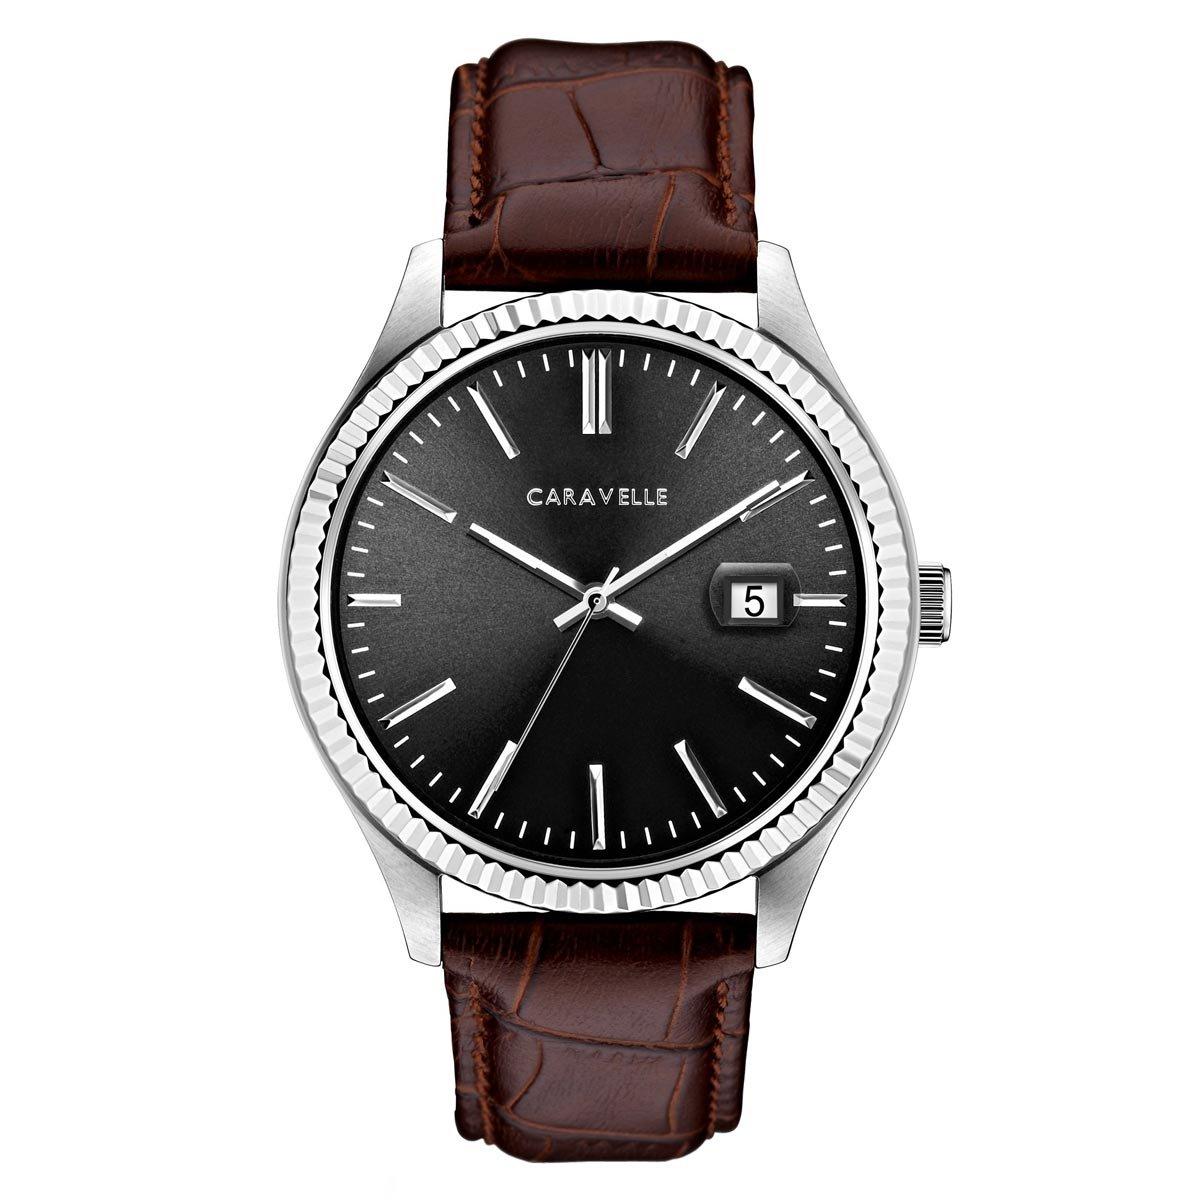 Caravelle by Bulova Men's Leather Strap Dress Watch